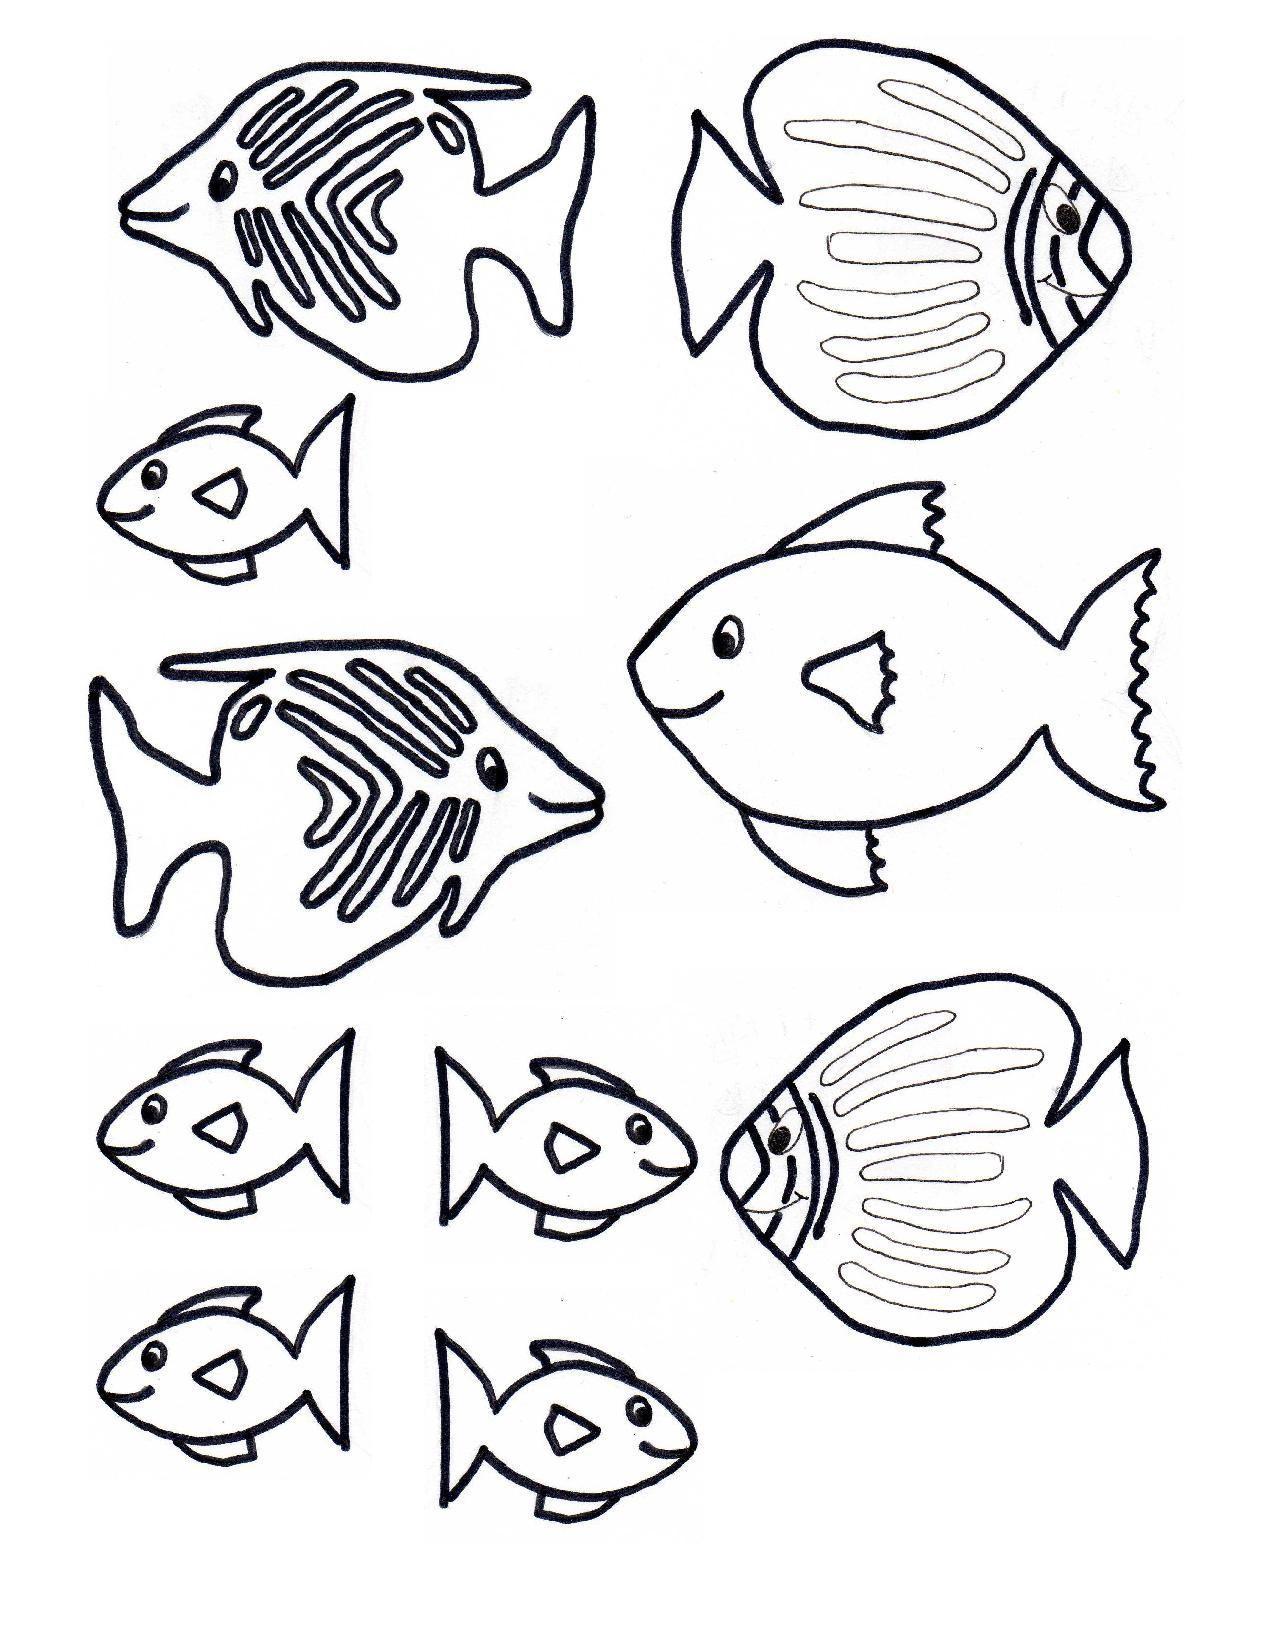 Fish Template Free Craft Underwater Kids Scene 1 1 275 1 650 Pixels